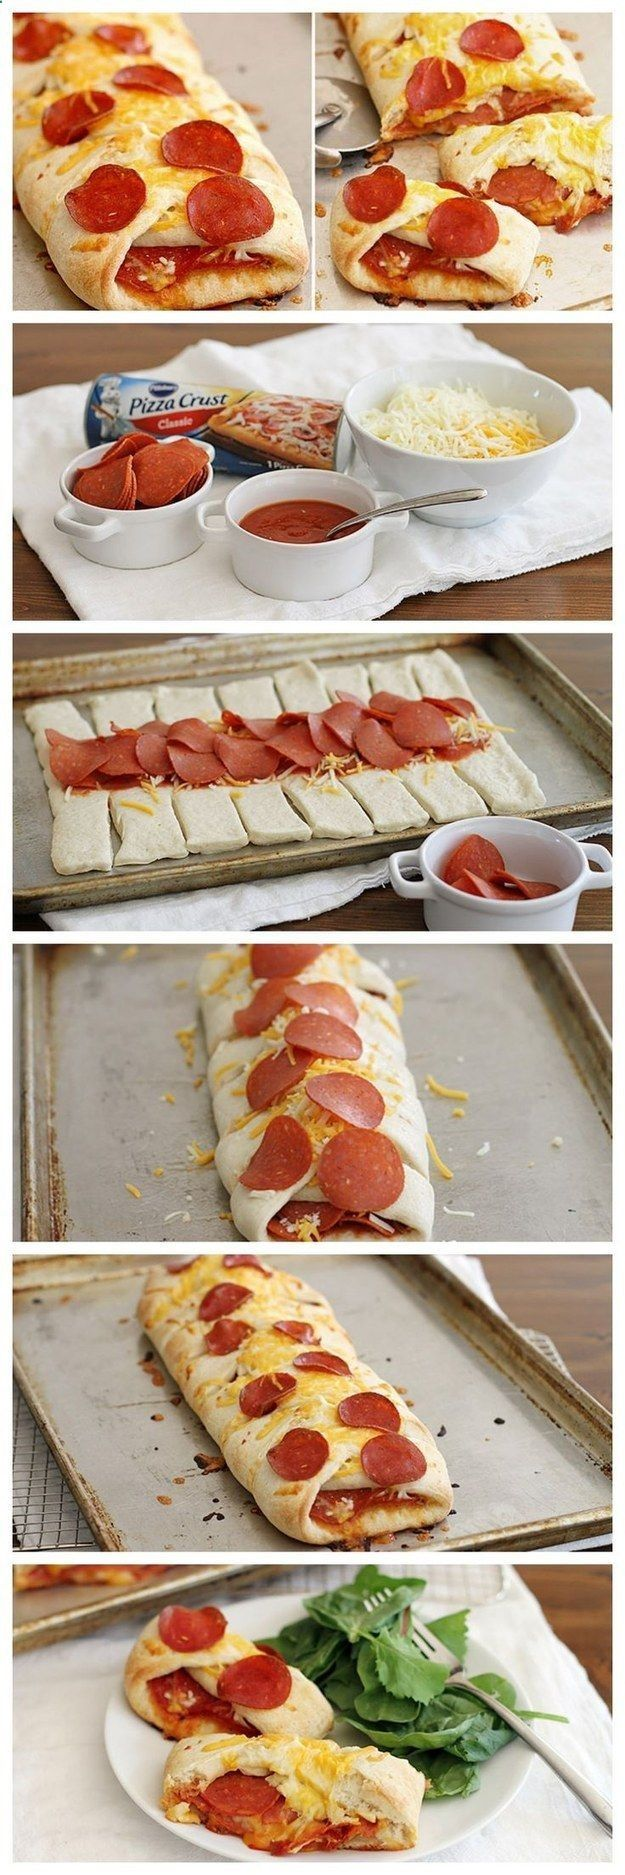 Pepperoni Pizza Braid | 21 Delicious Ideas For Pizza Night